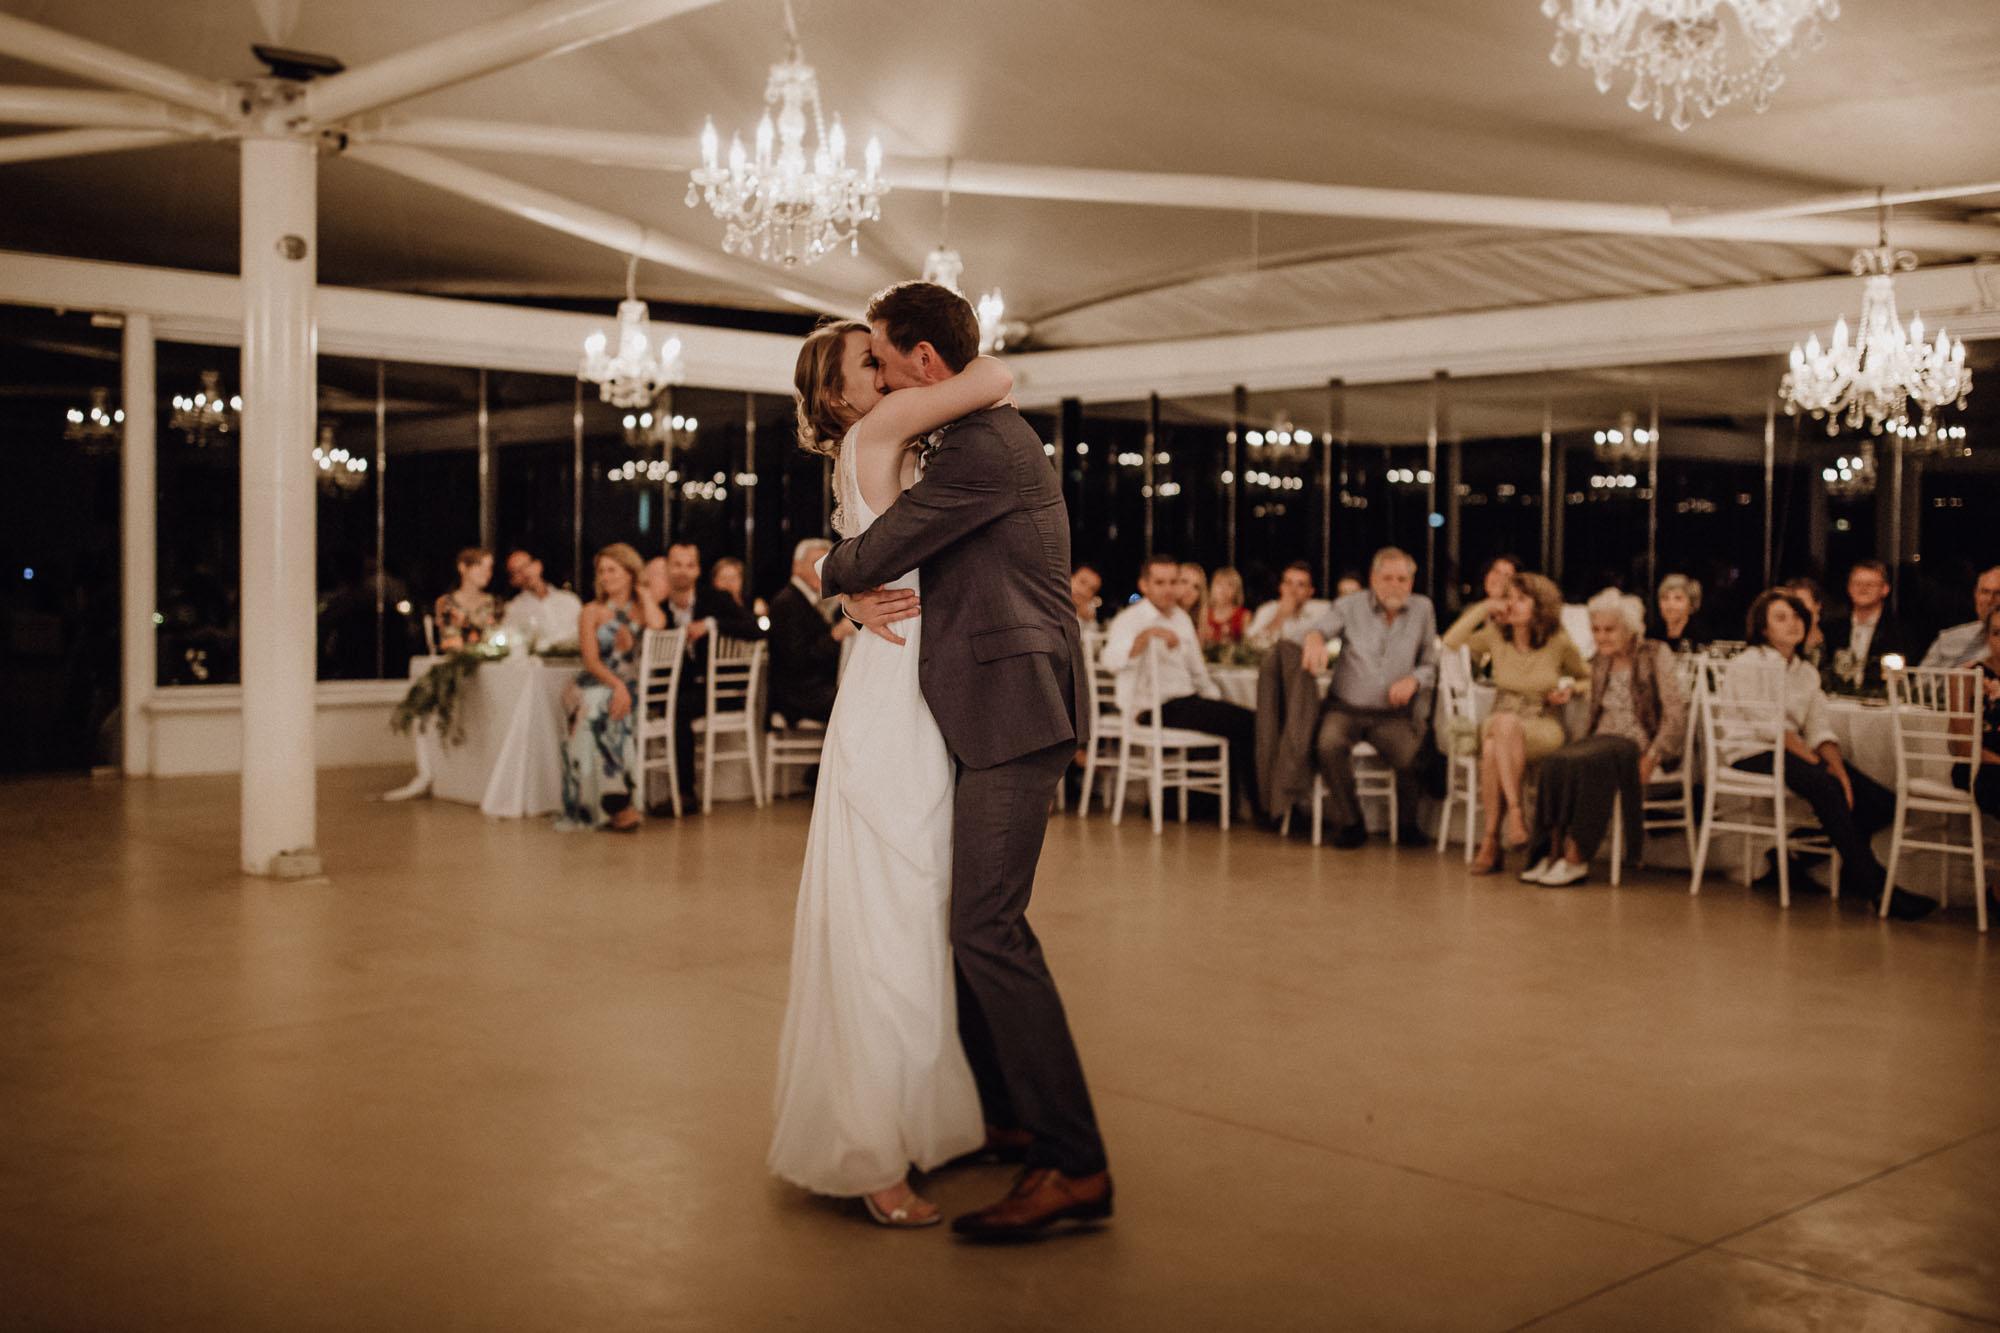 Das Brautpaar tanz